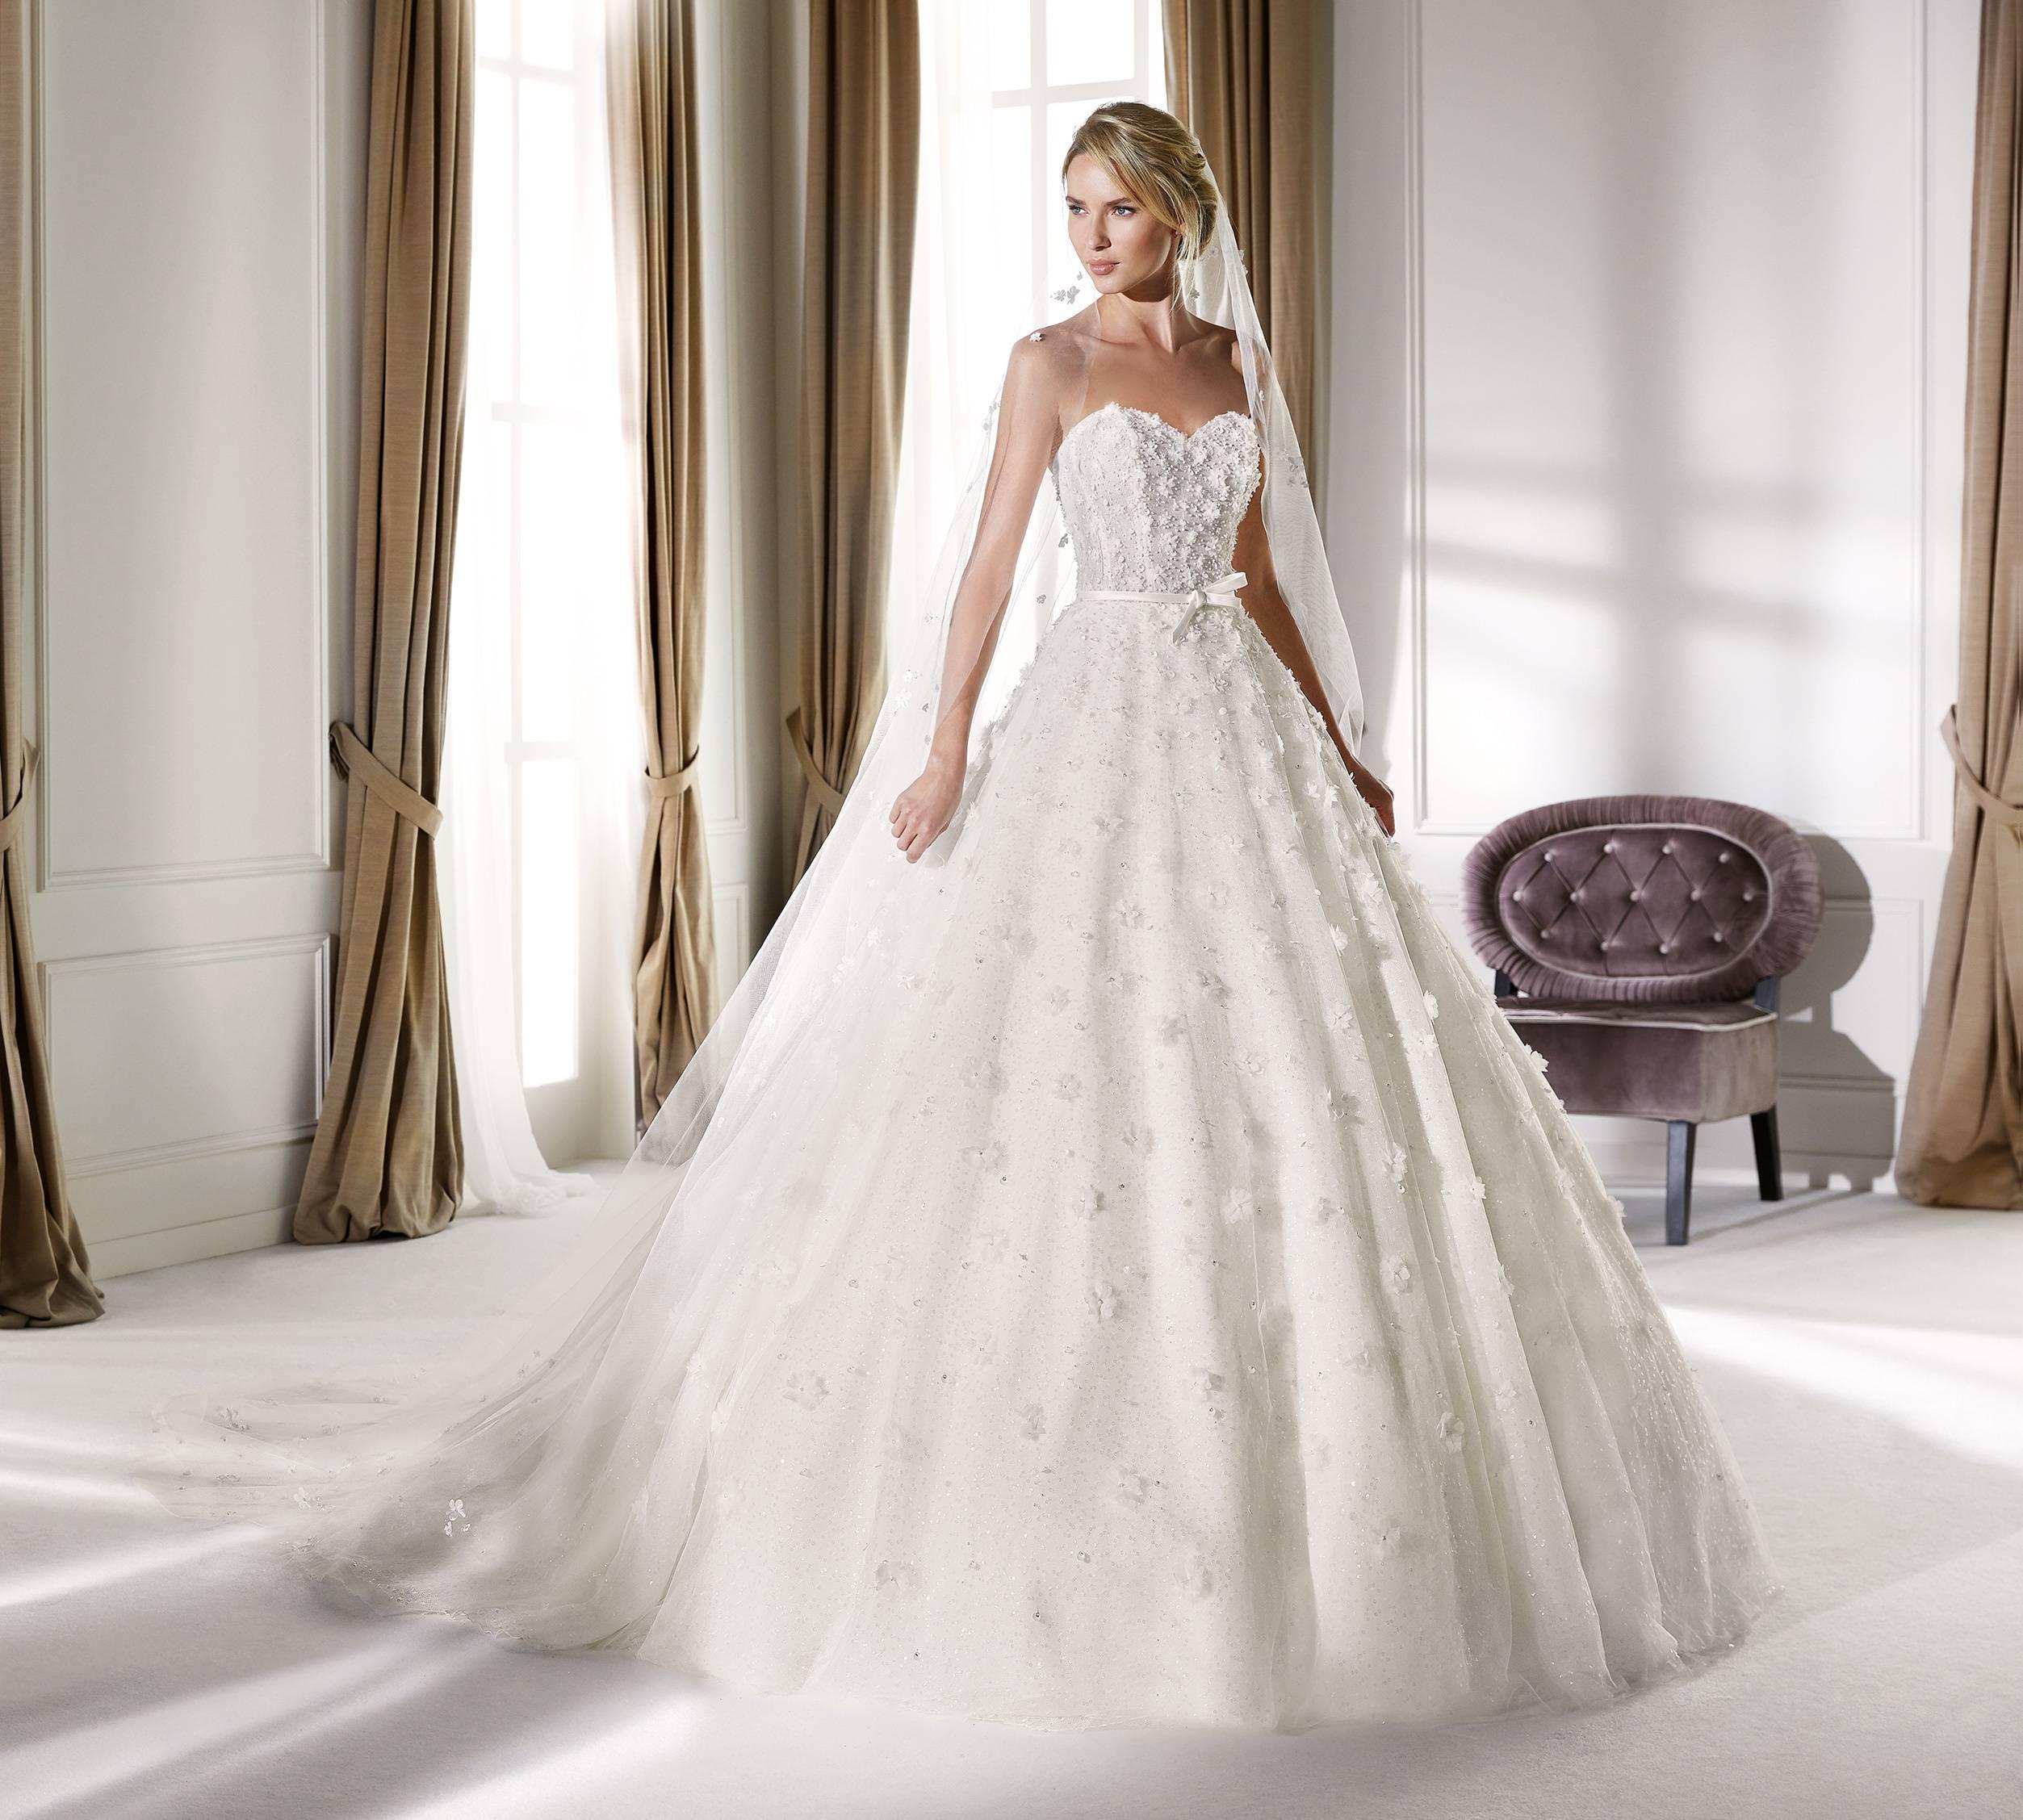 NICOLE MILANO NIA20471 WEDDING DRESS